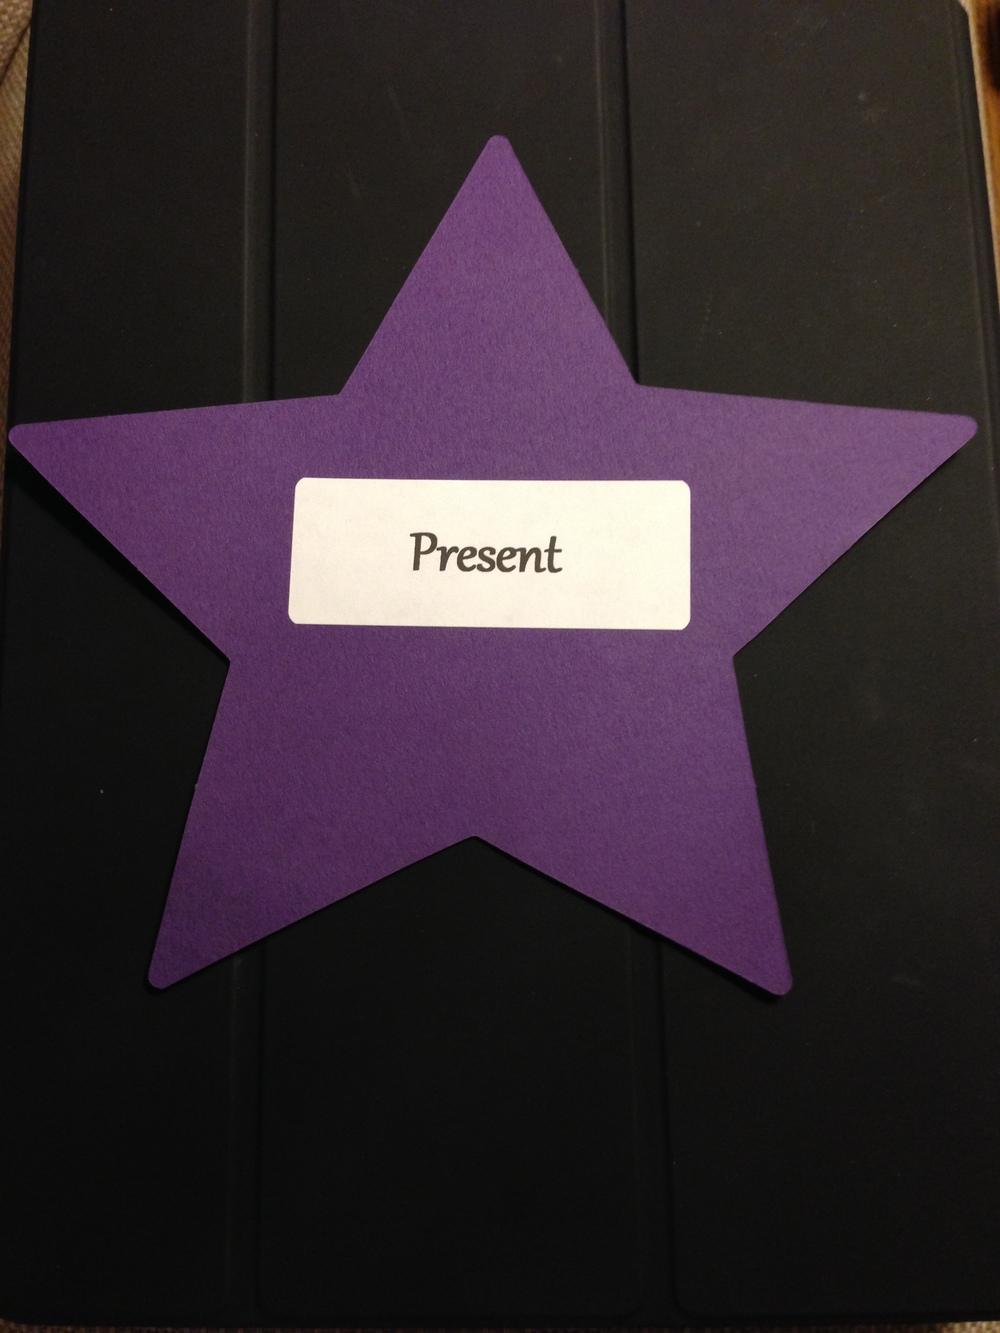 Pastor Leanne's StarWord - Present.